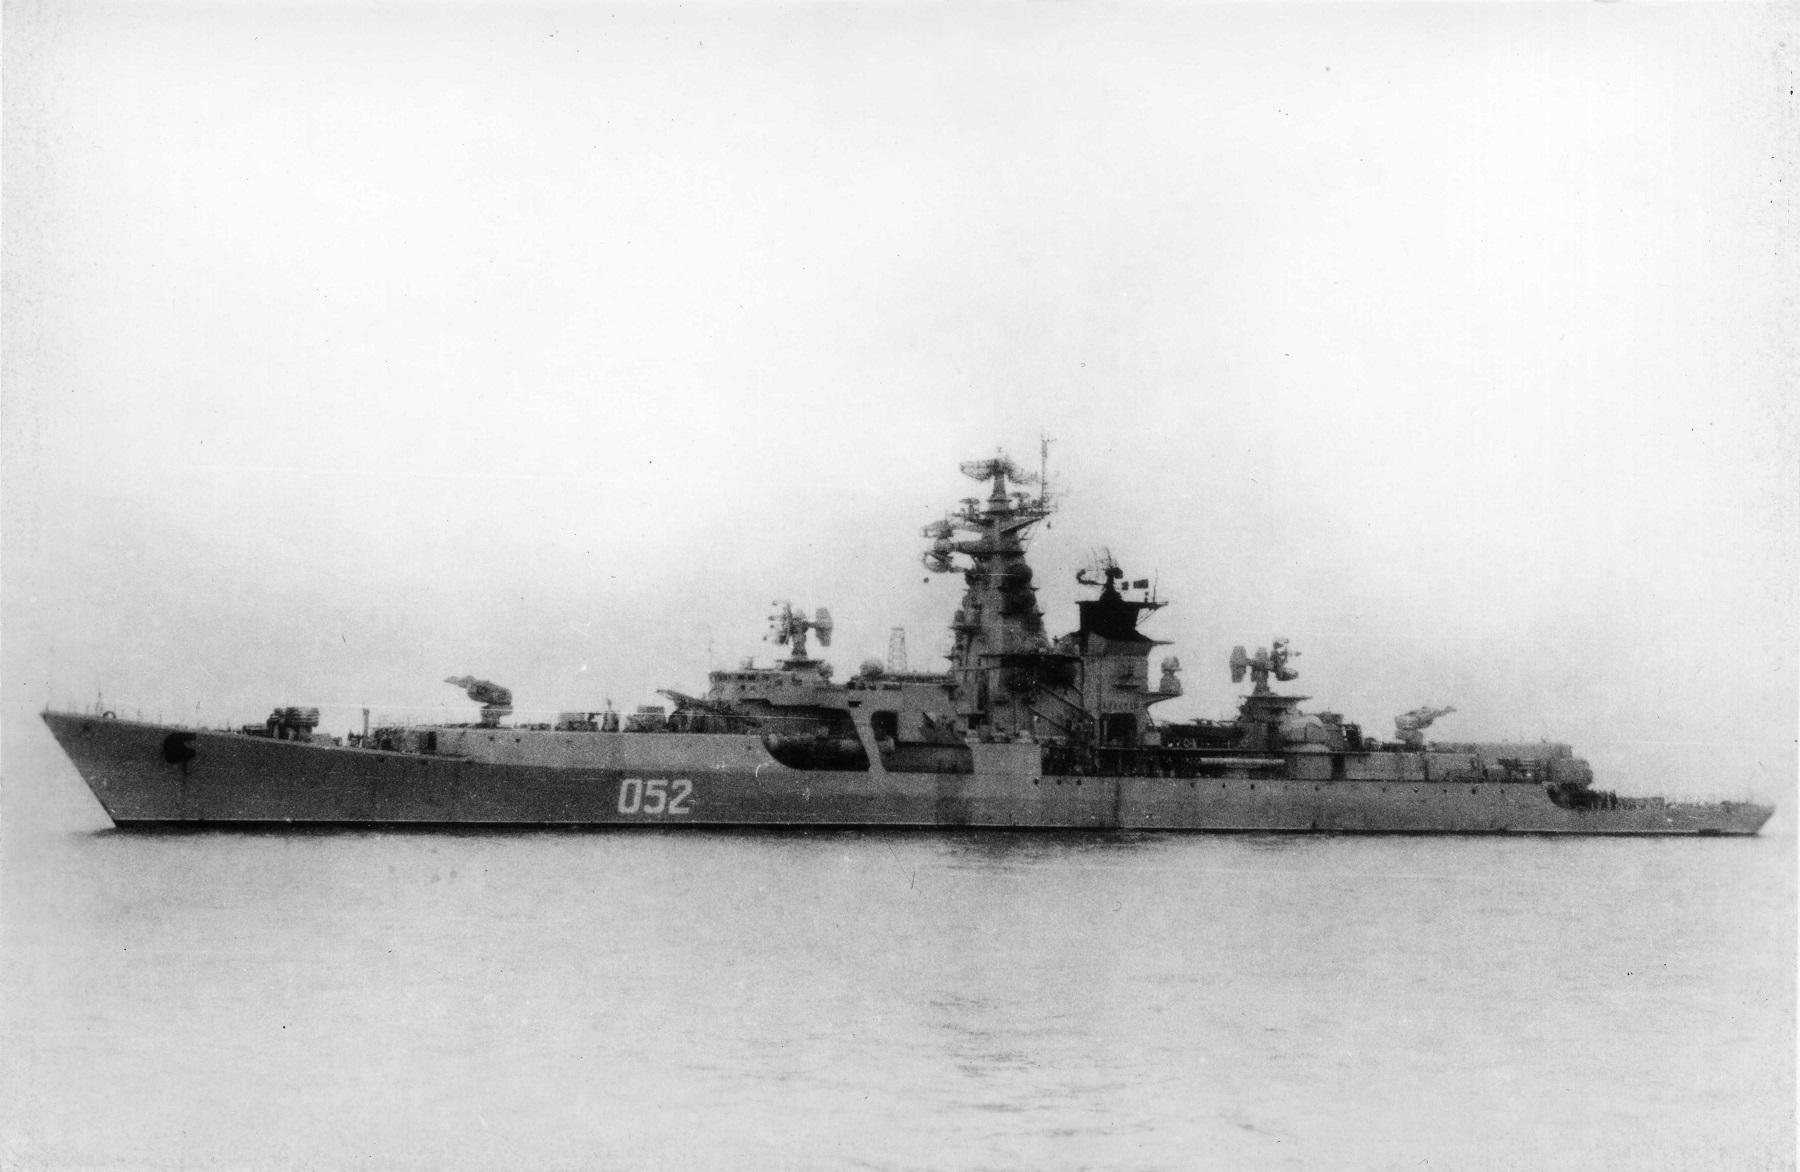 P1134.jpg